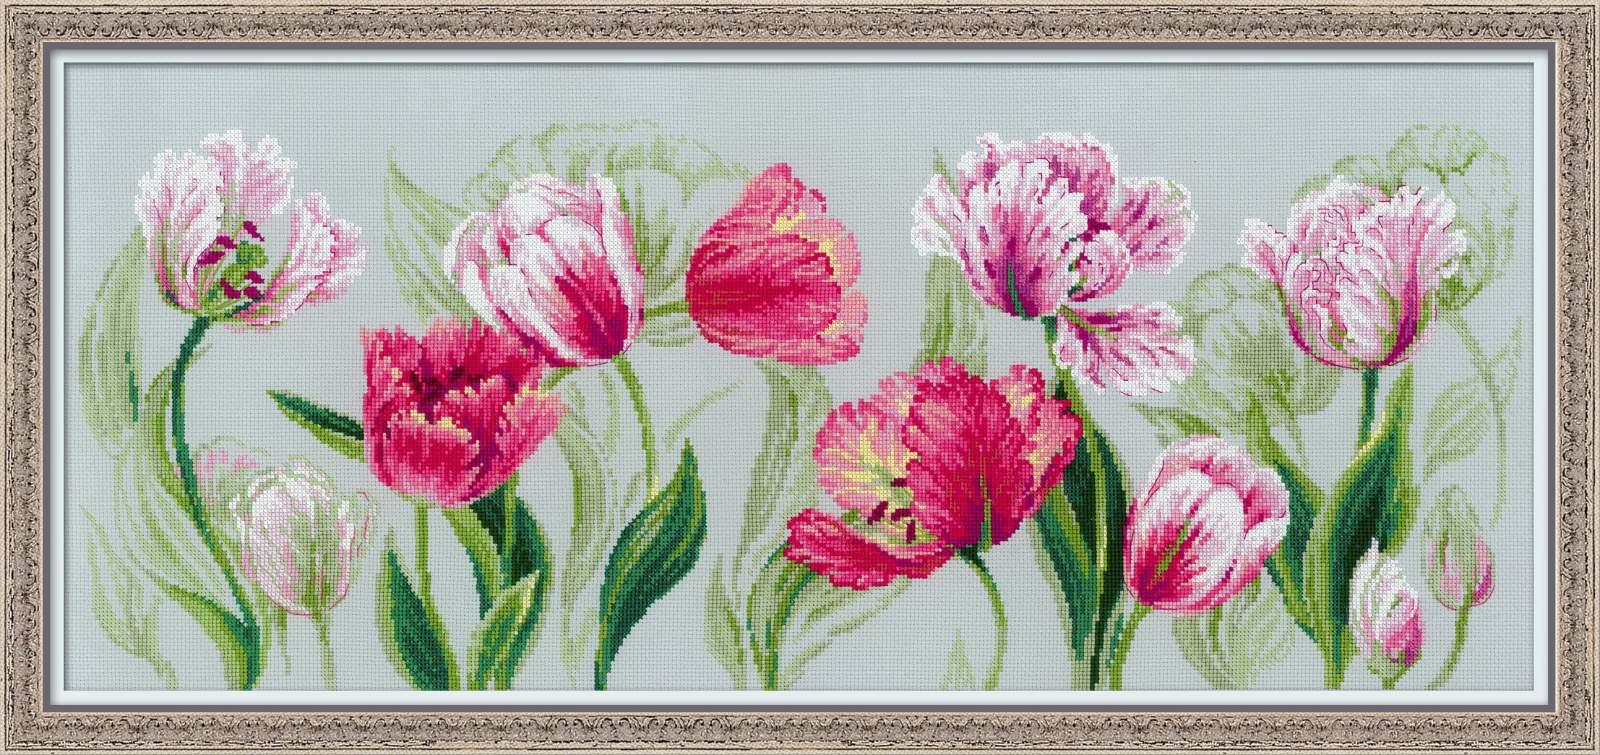 RIOLISクロスステッチ刺繍キット No.100/052 「Spring Tulips」 (春のチューリップ) 【取り寄せ/納期1~2ヶ月】